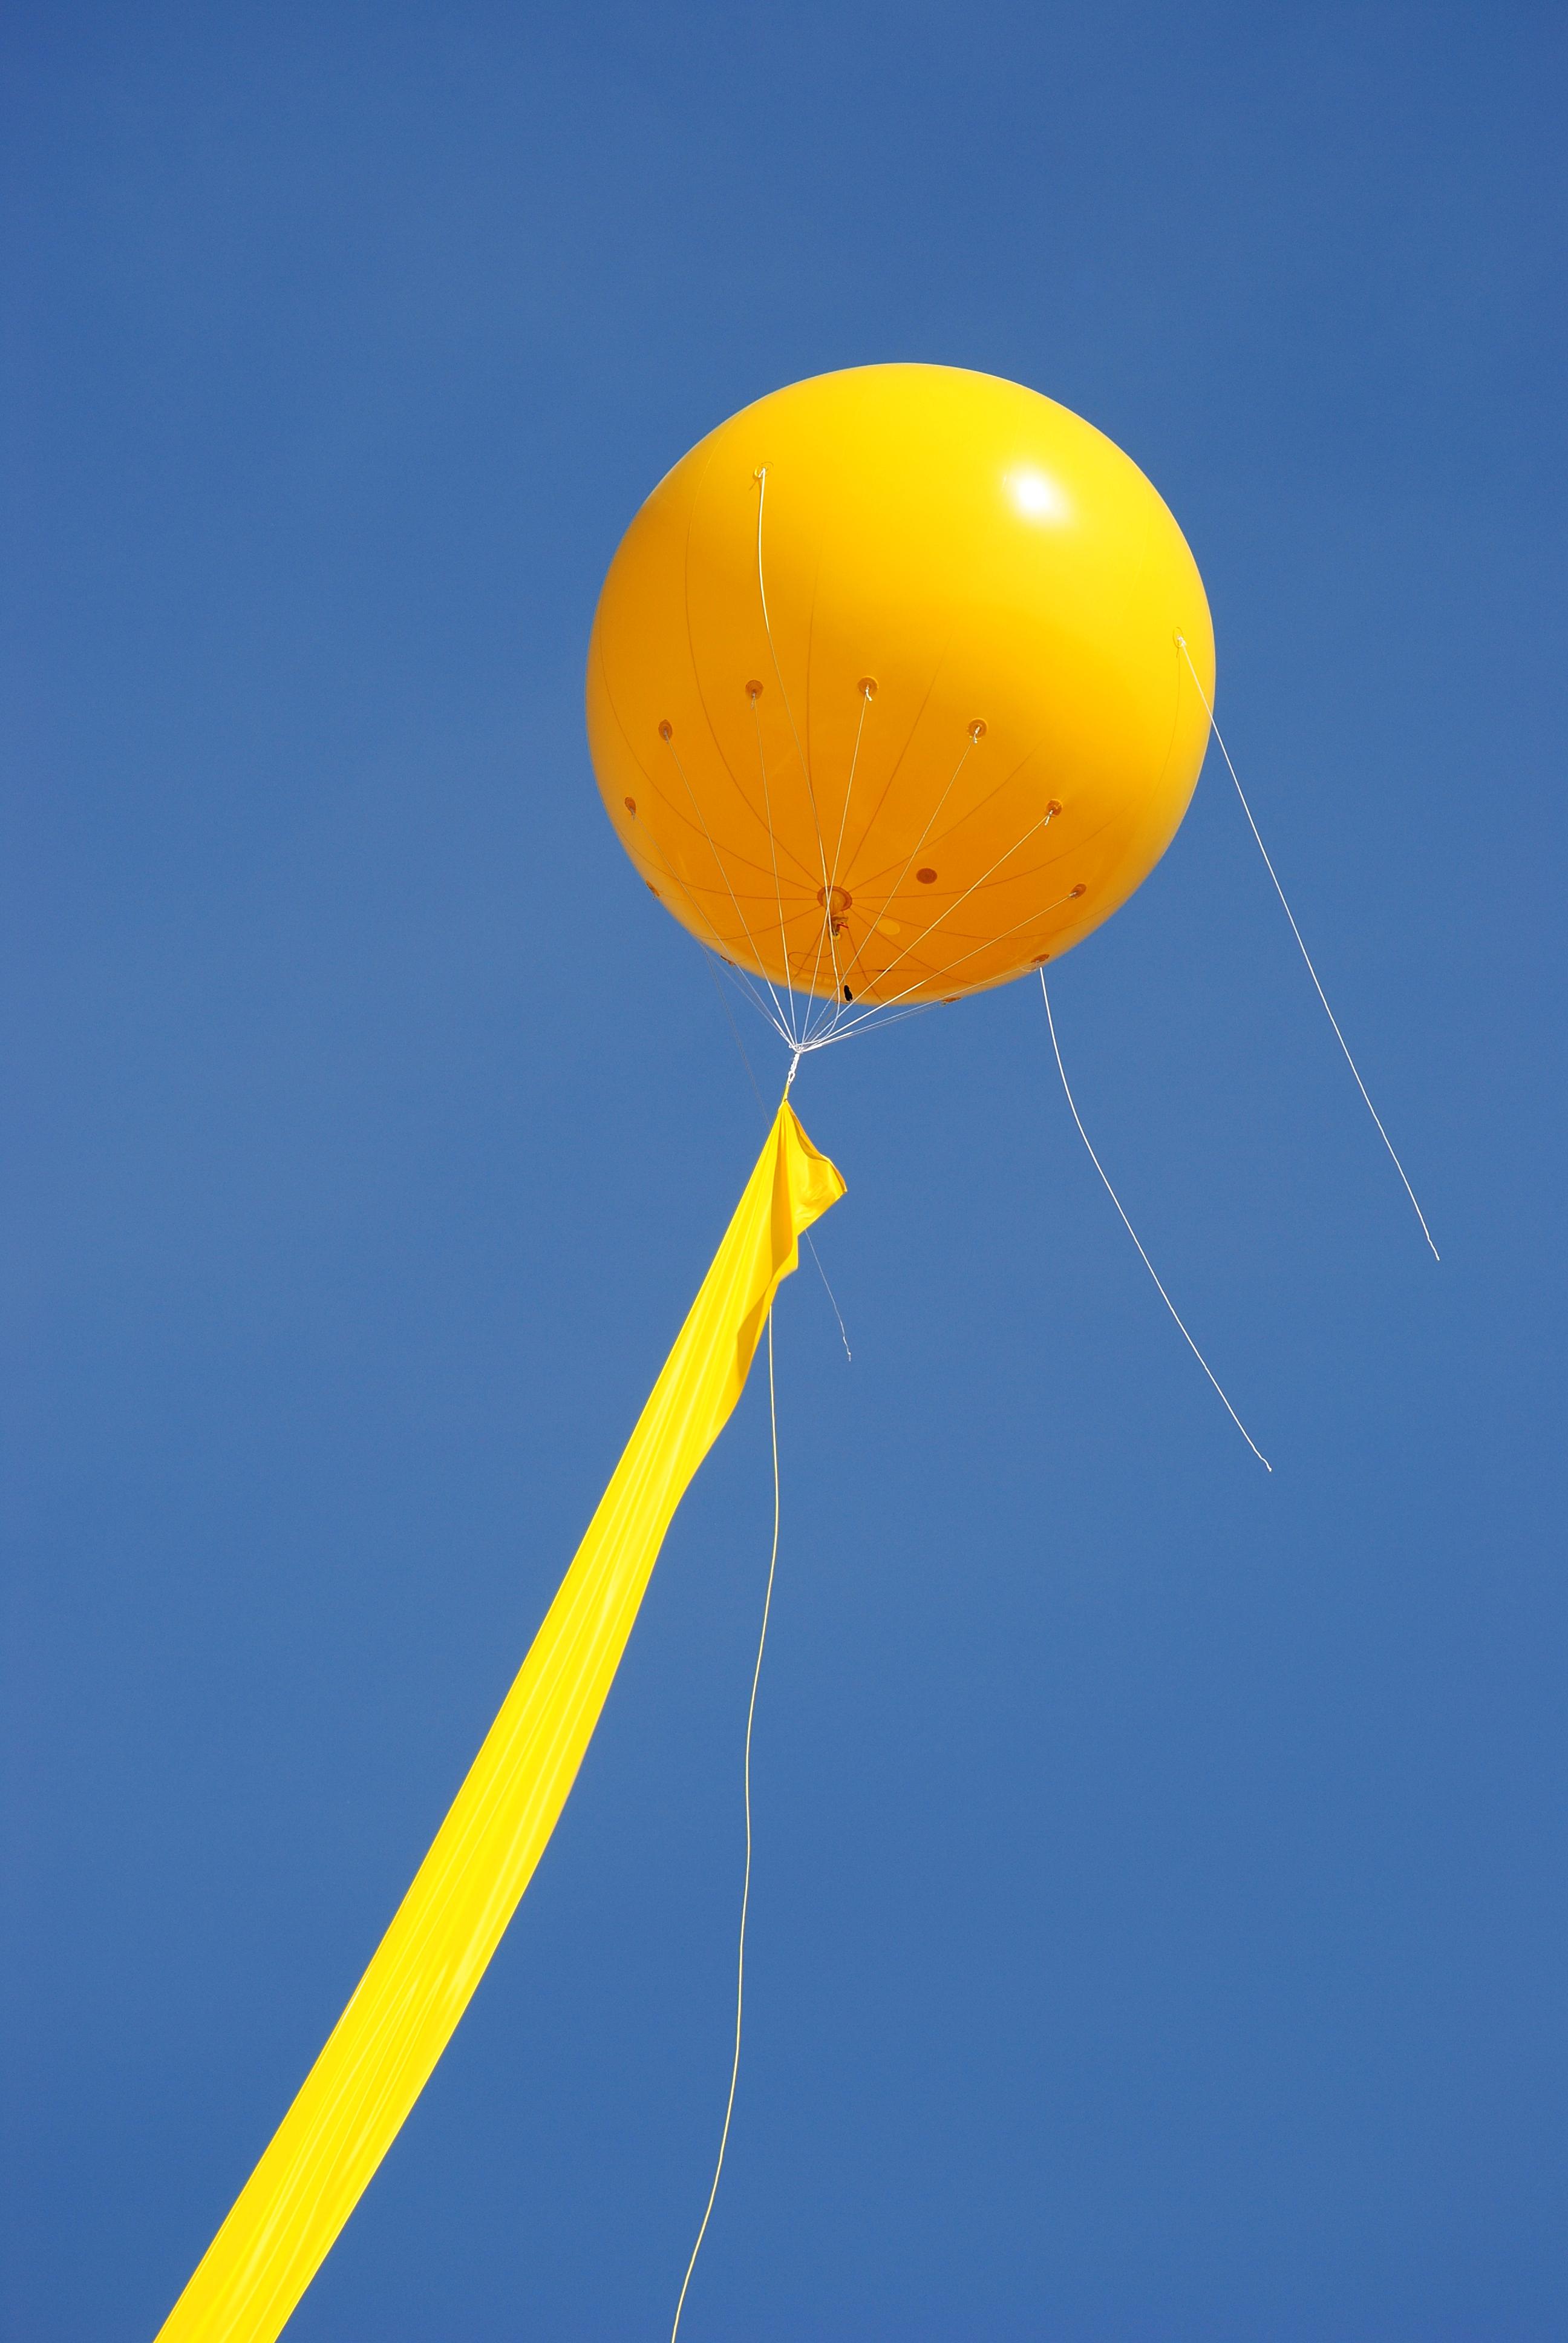 File schachtzeichen diergardt 2 wikimedia commons for Heliumballons duisburg